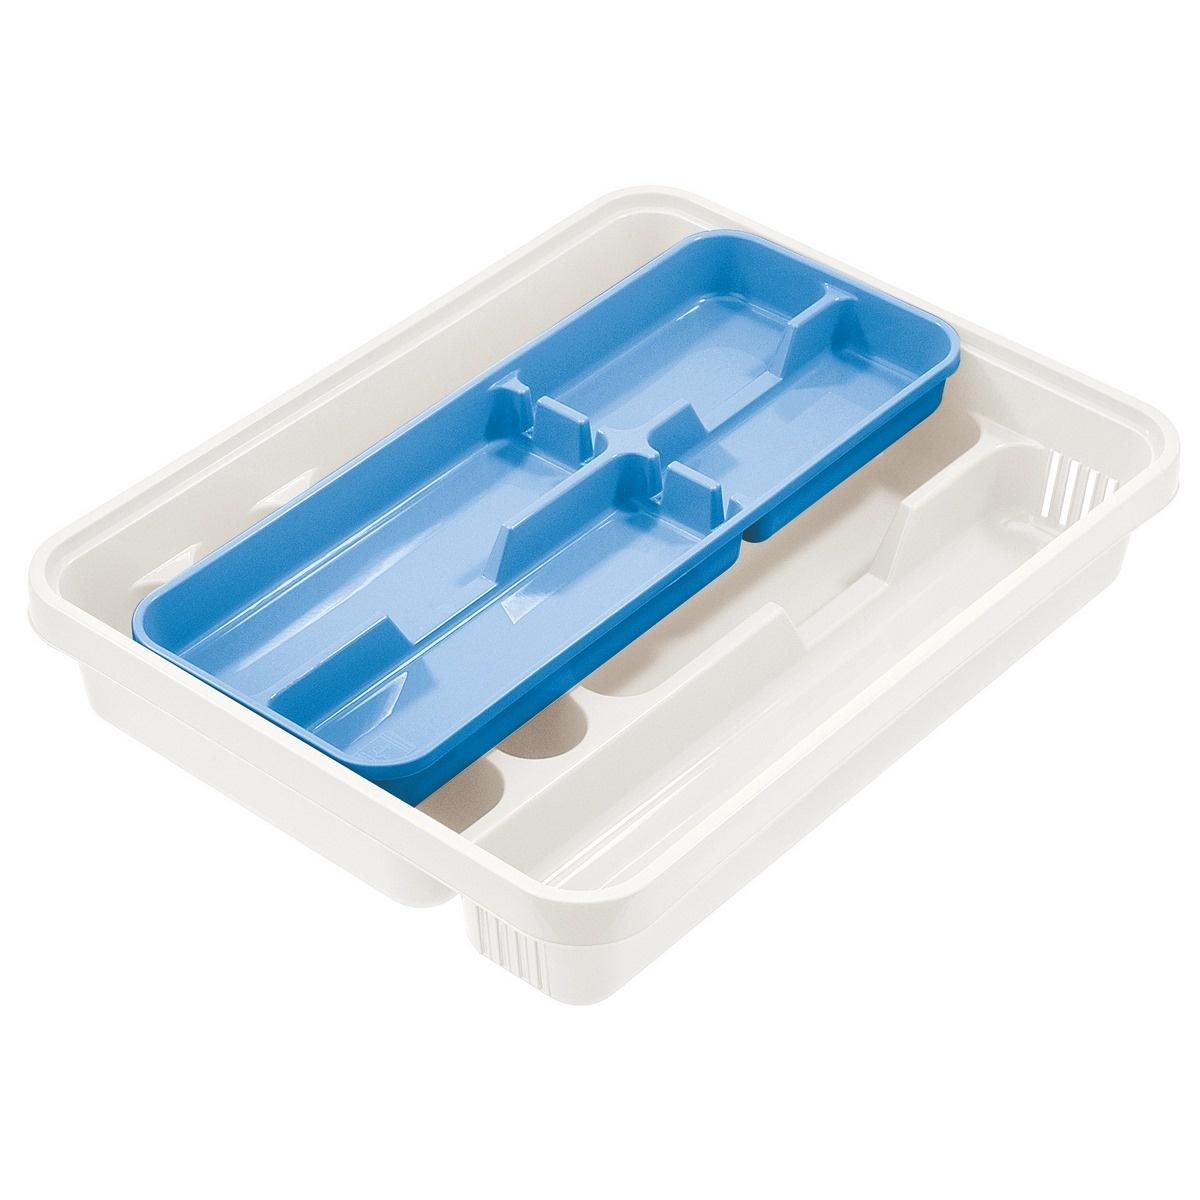 Tontarelli Příborník Mixy 2 díly krémová/světle modrá 8071122A7Q